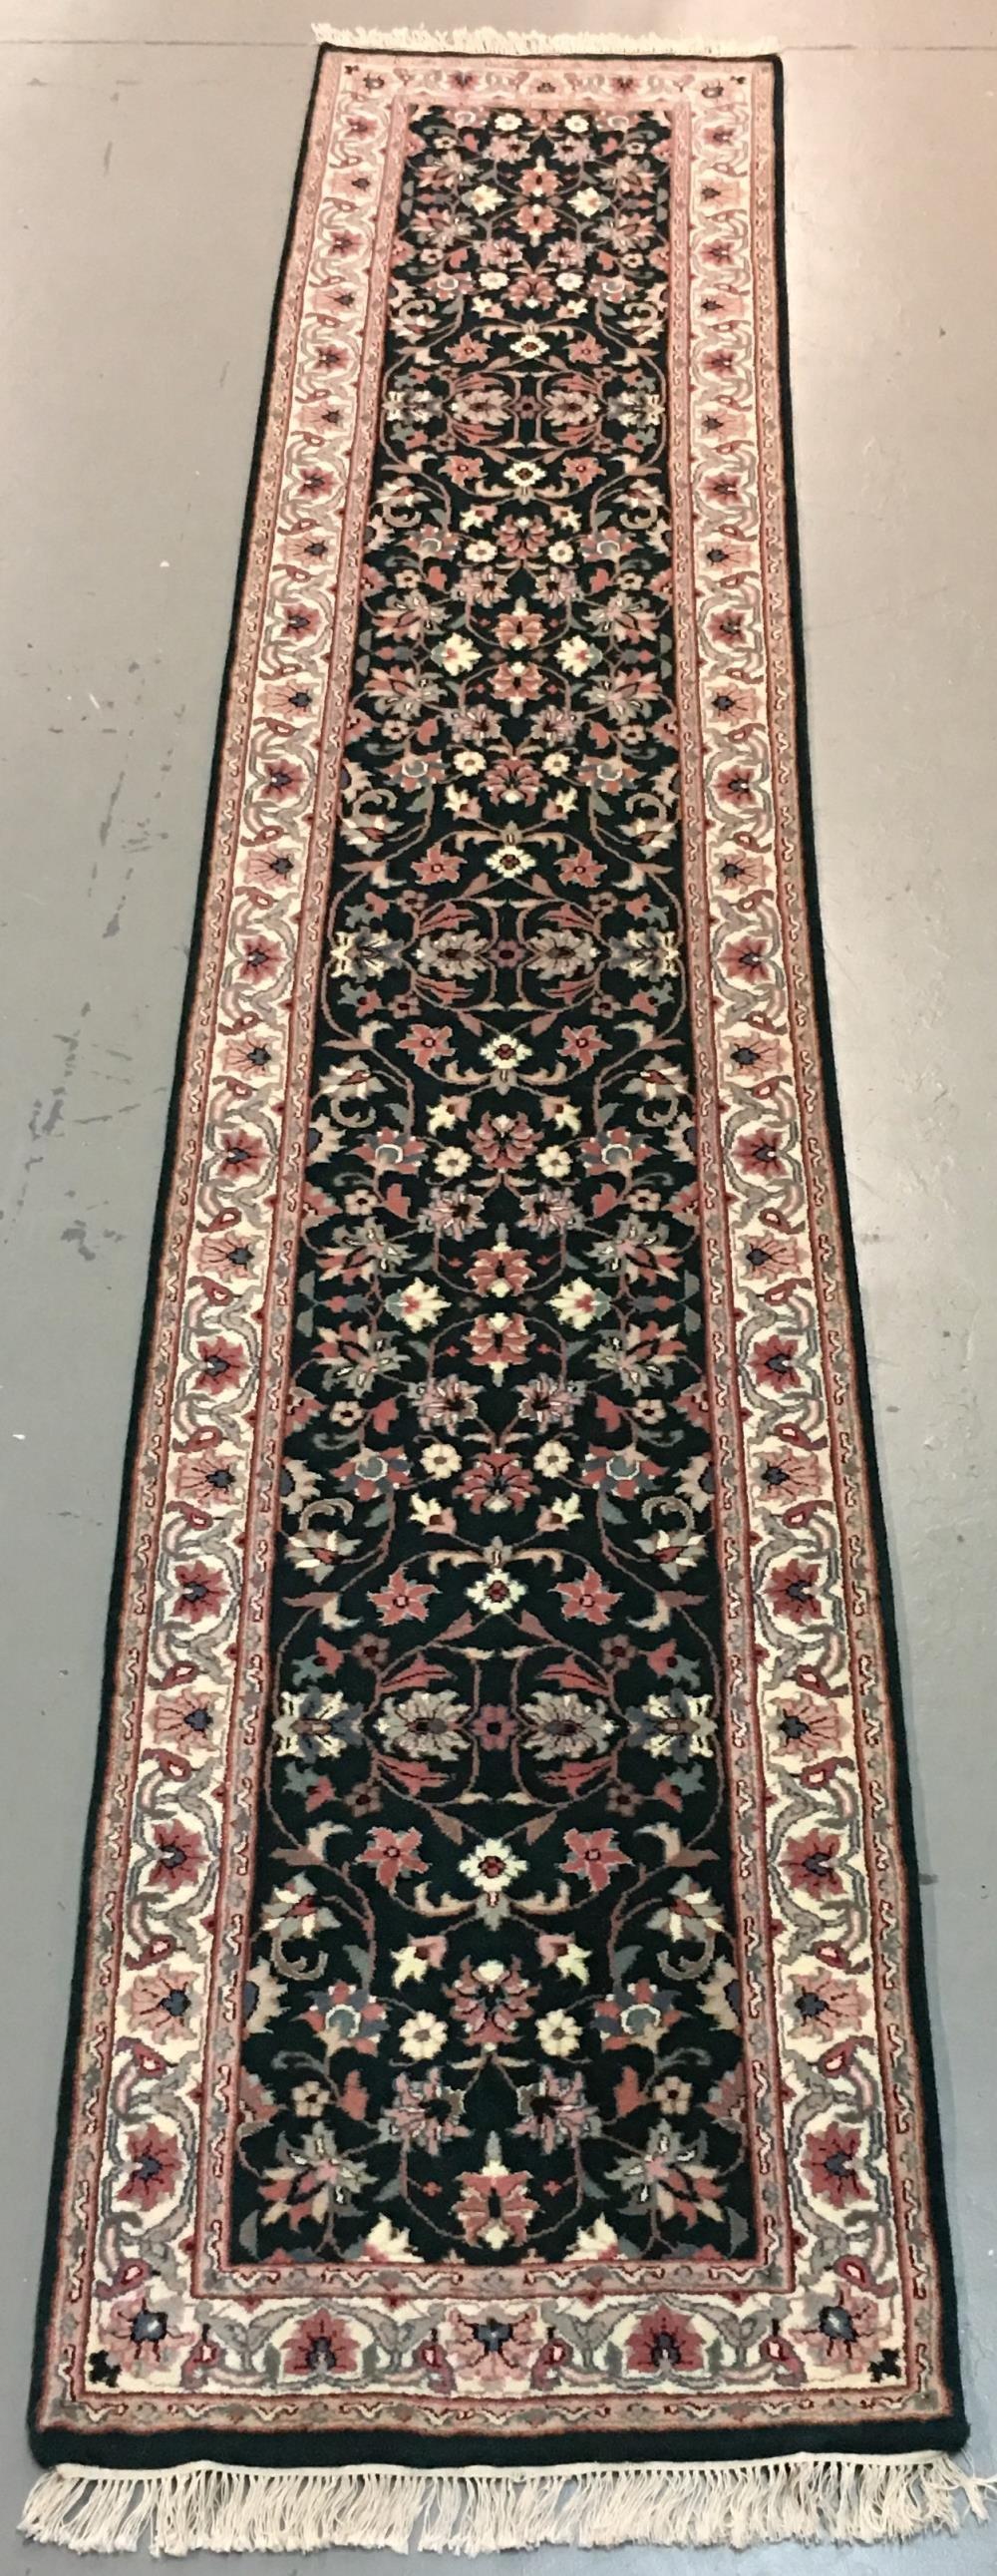 Handmade Indo Kashan 2.8x13.5